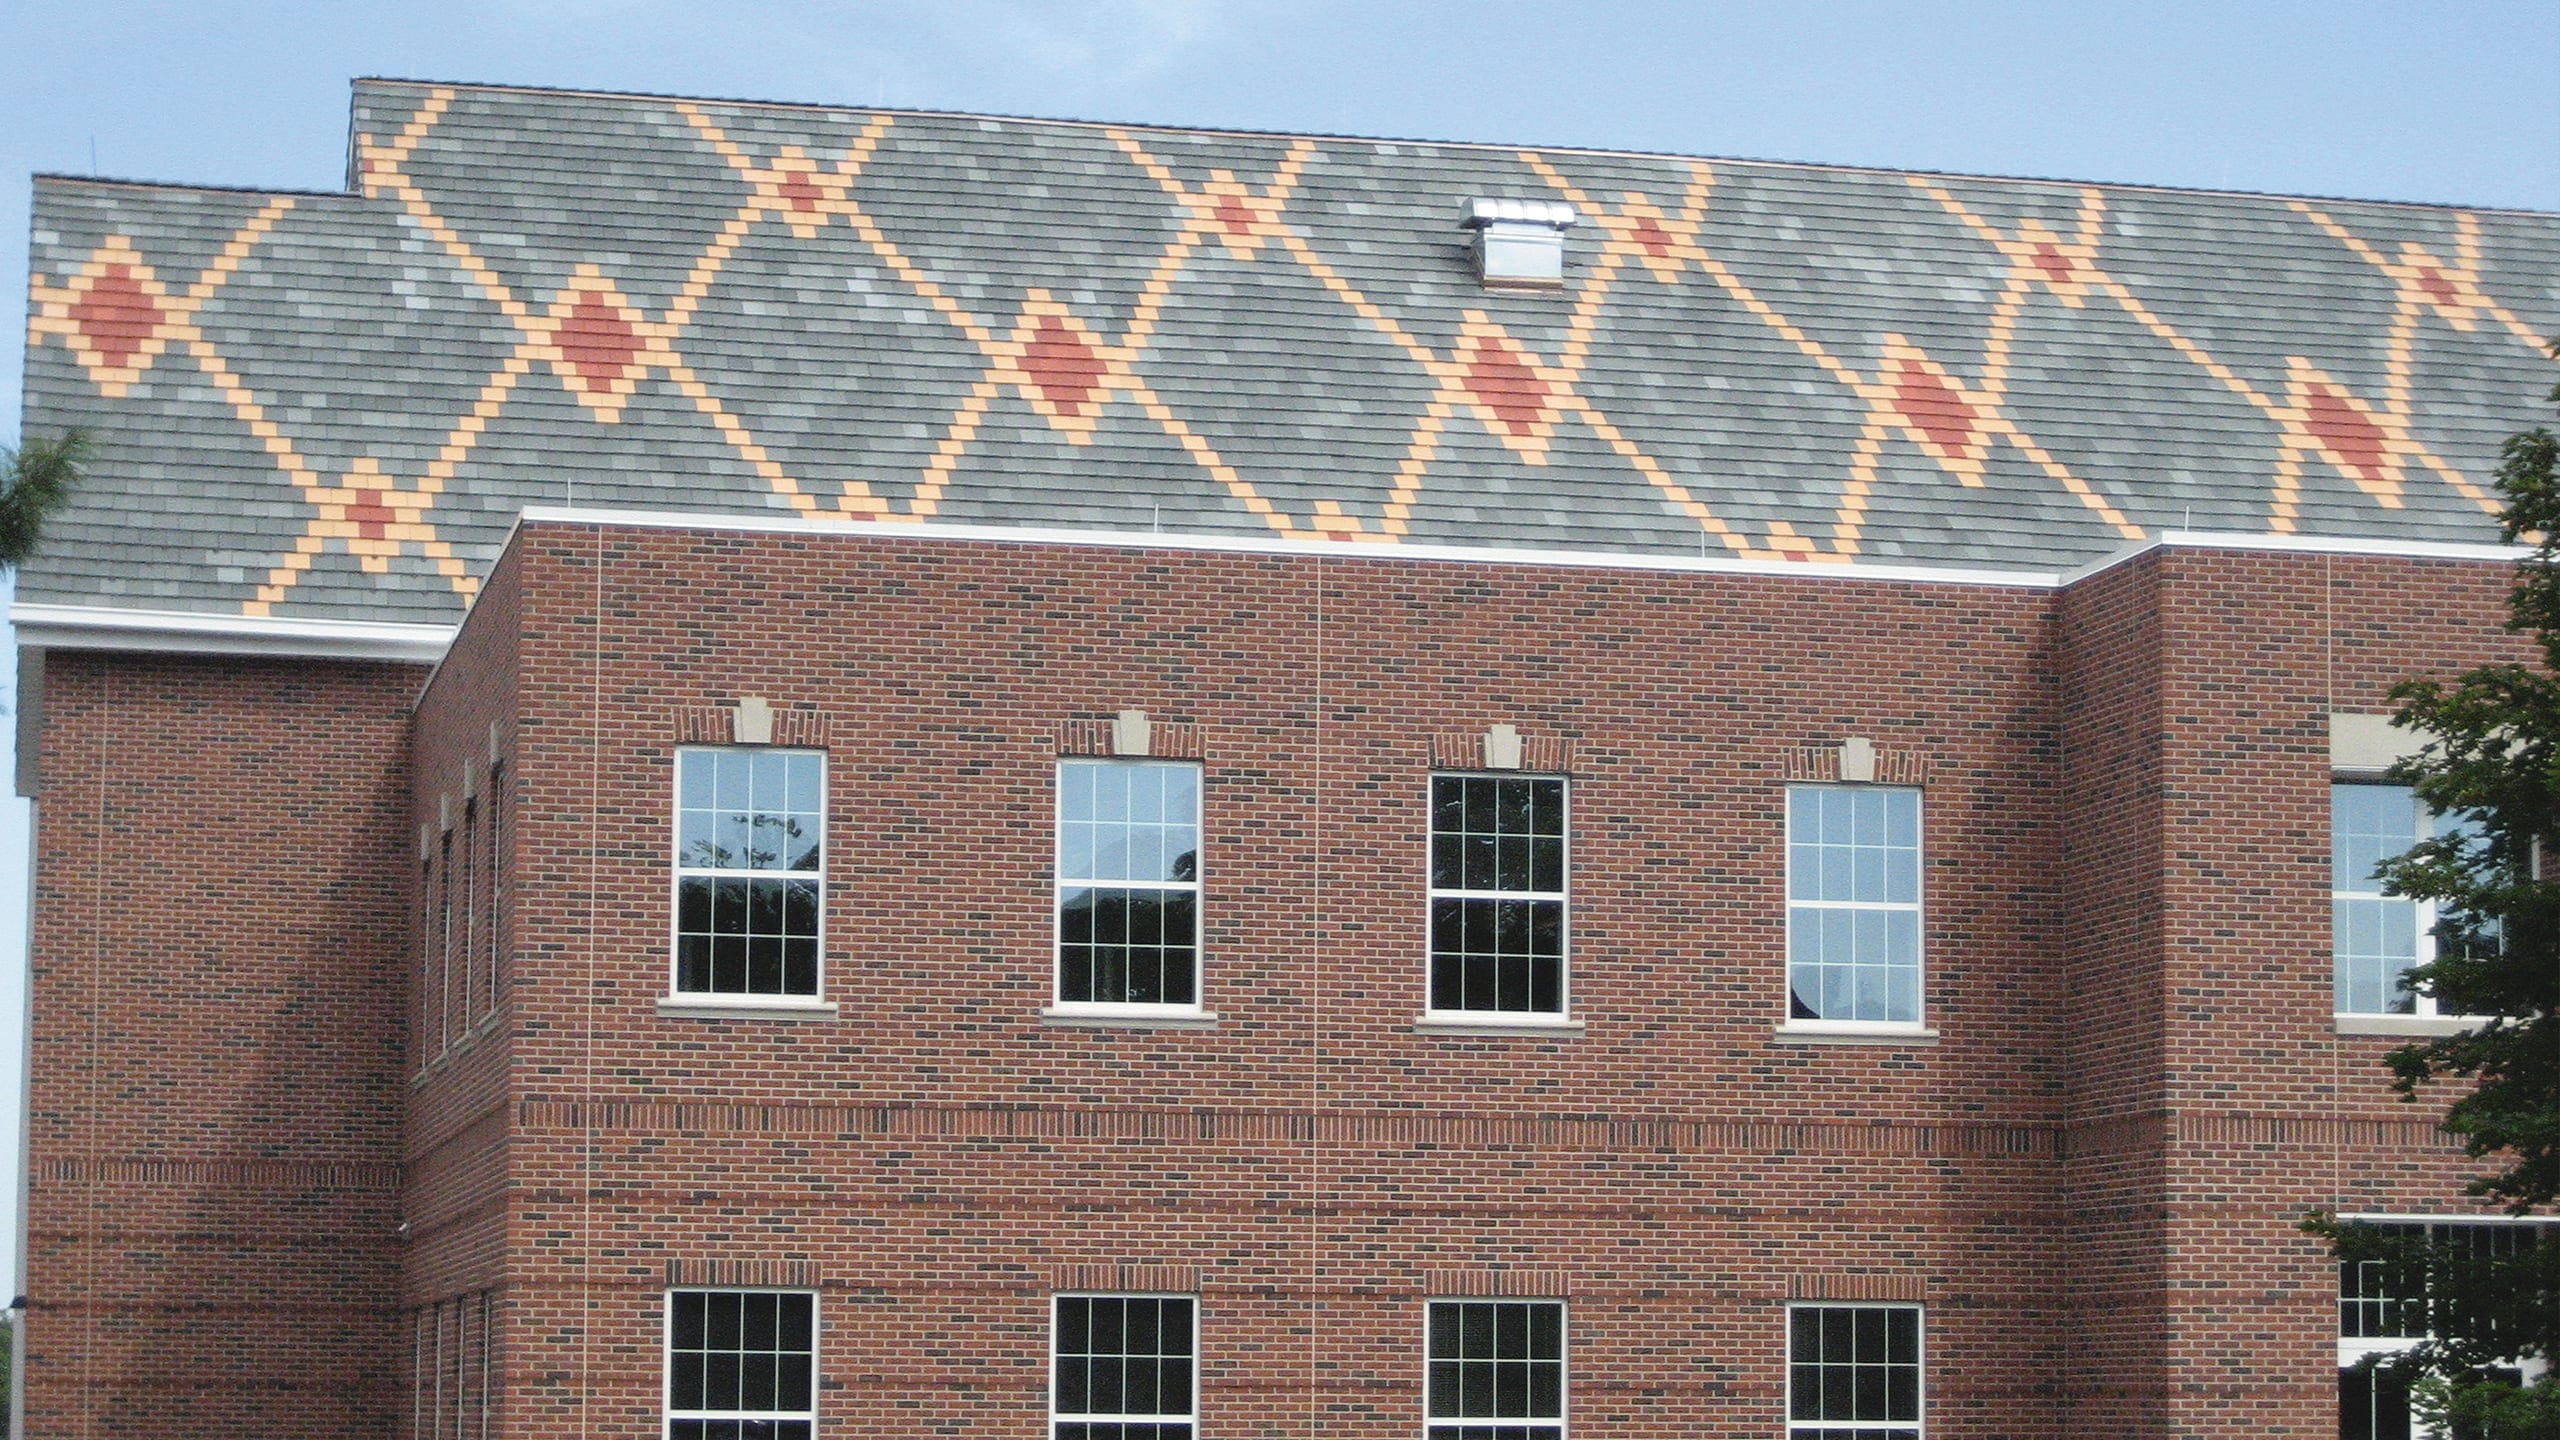 Iowa State University Ludowici Roof Tile